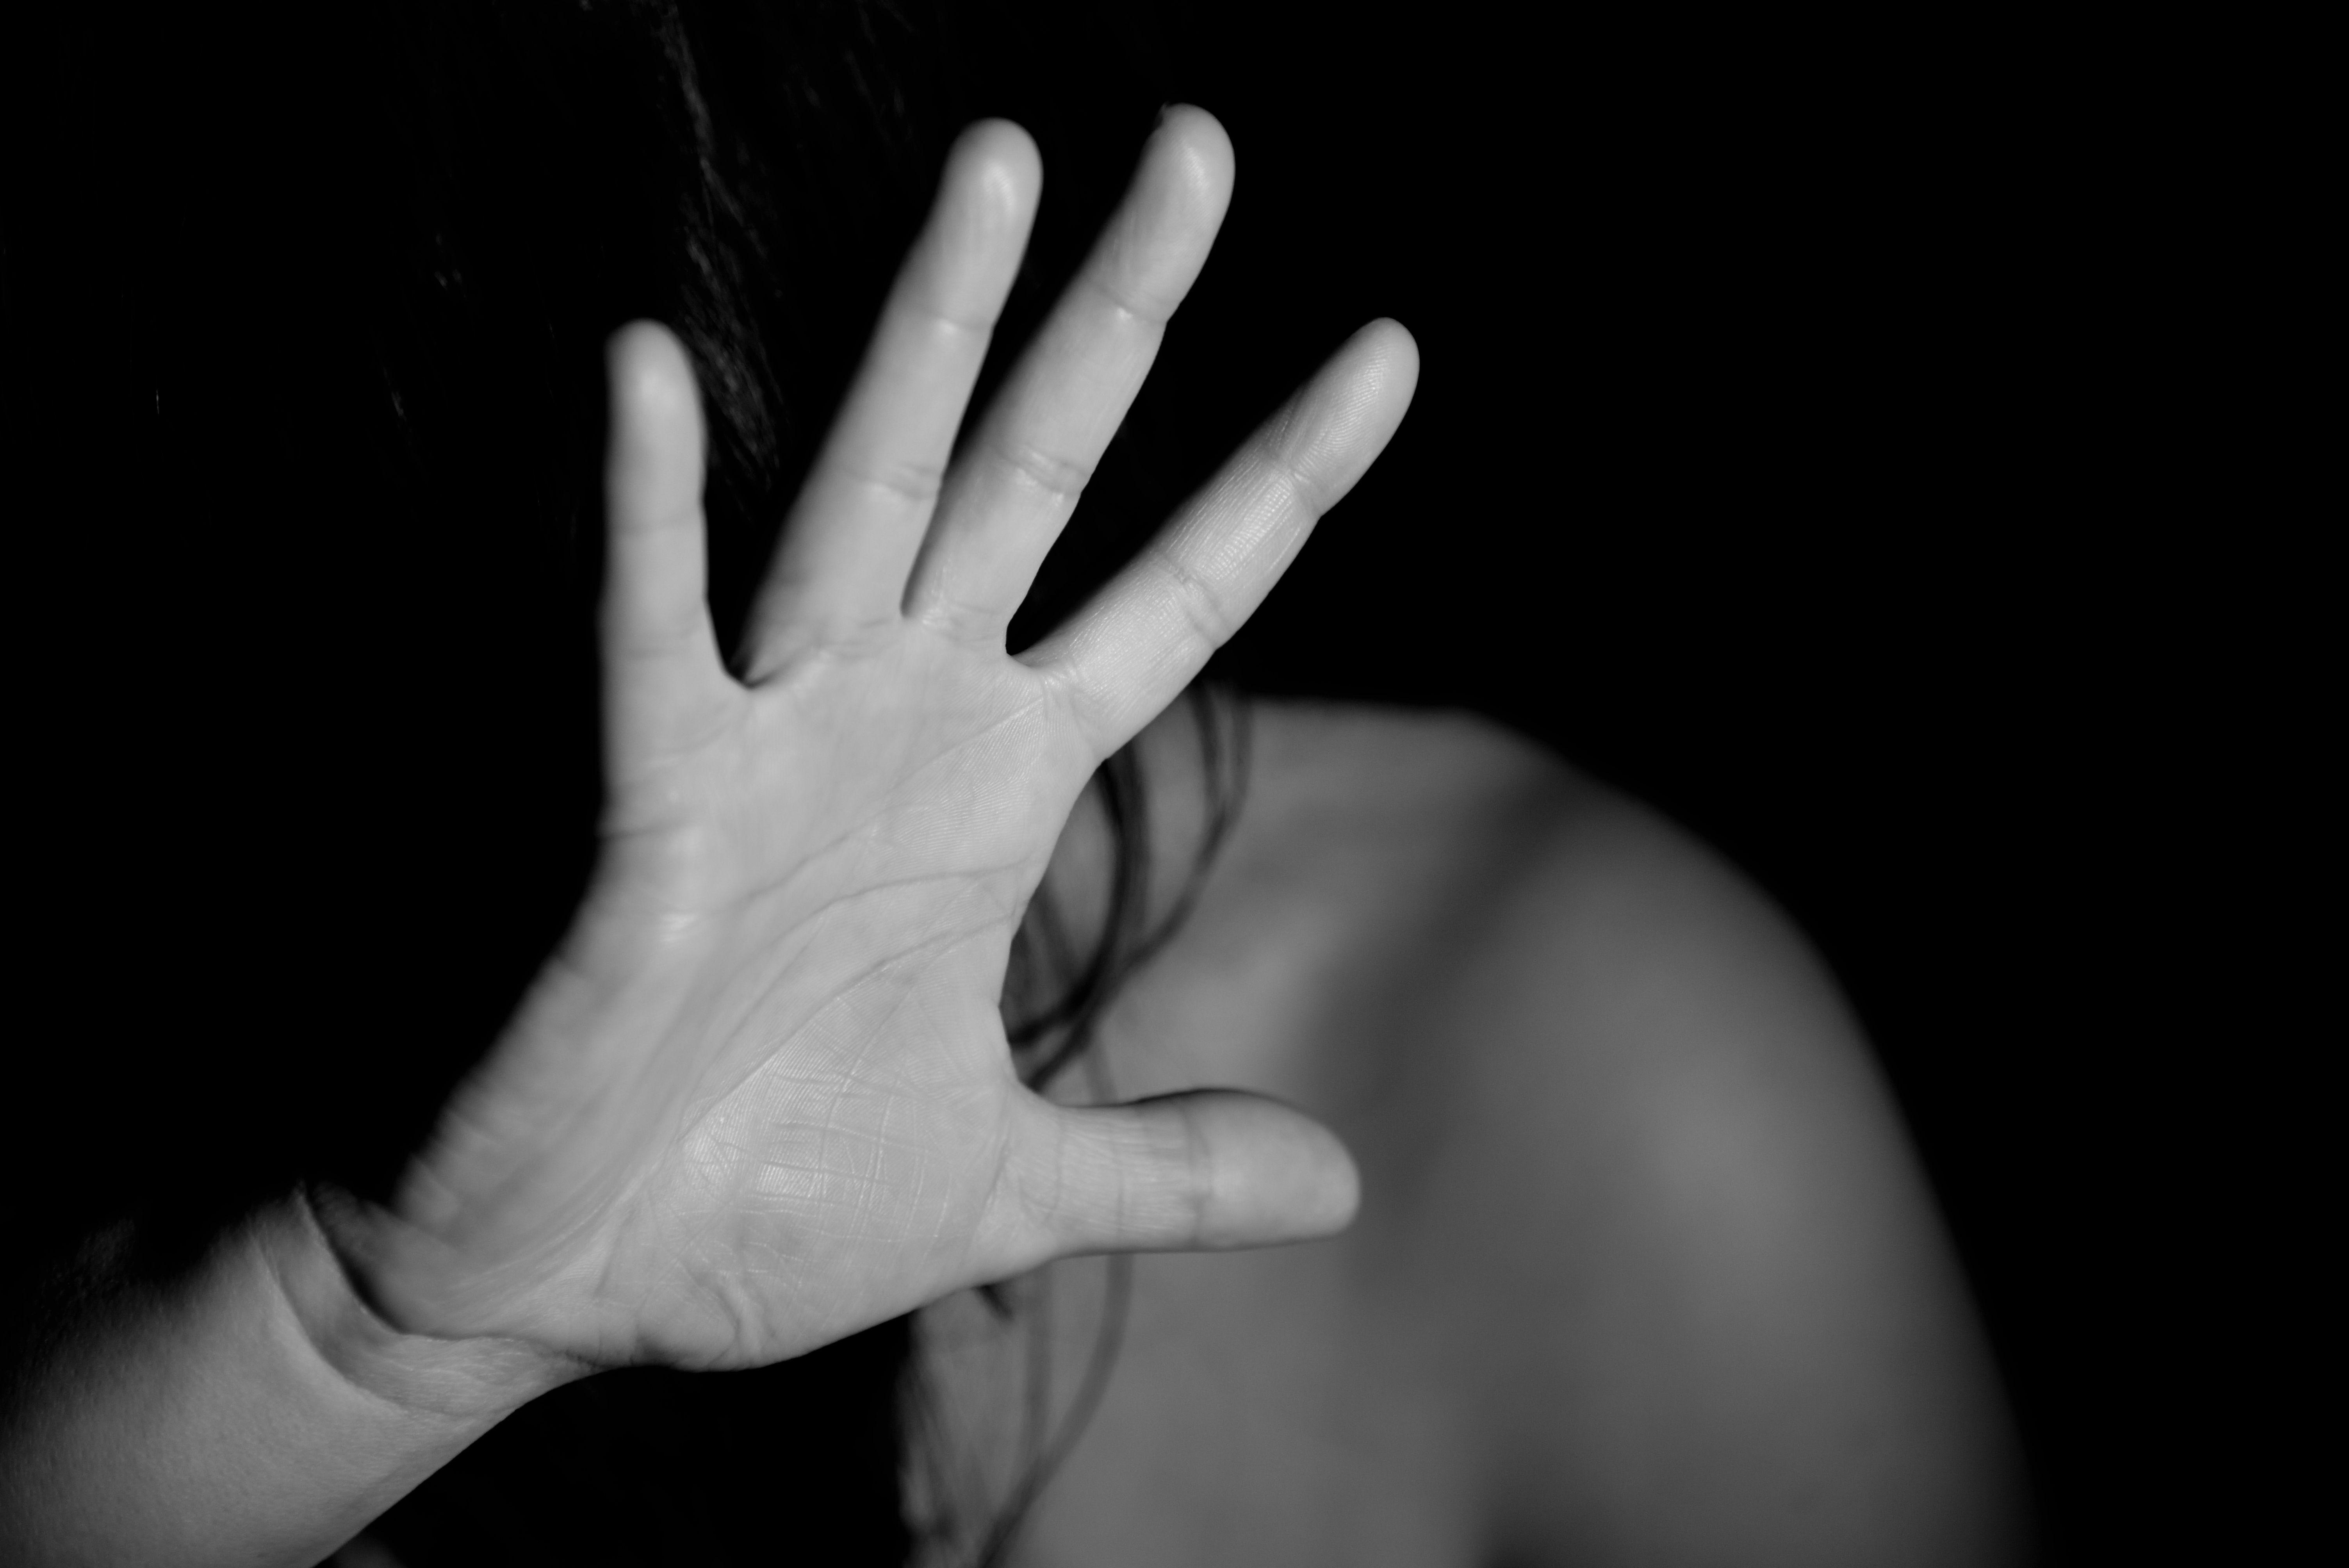 violencia genere masclisme- Pixabay